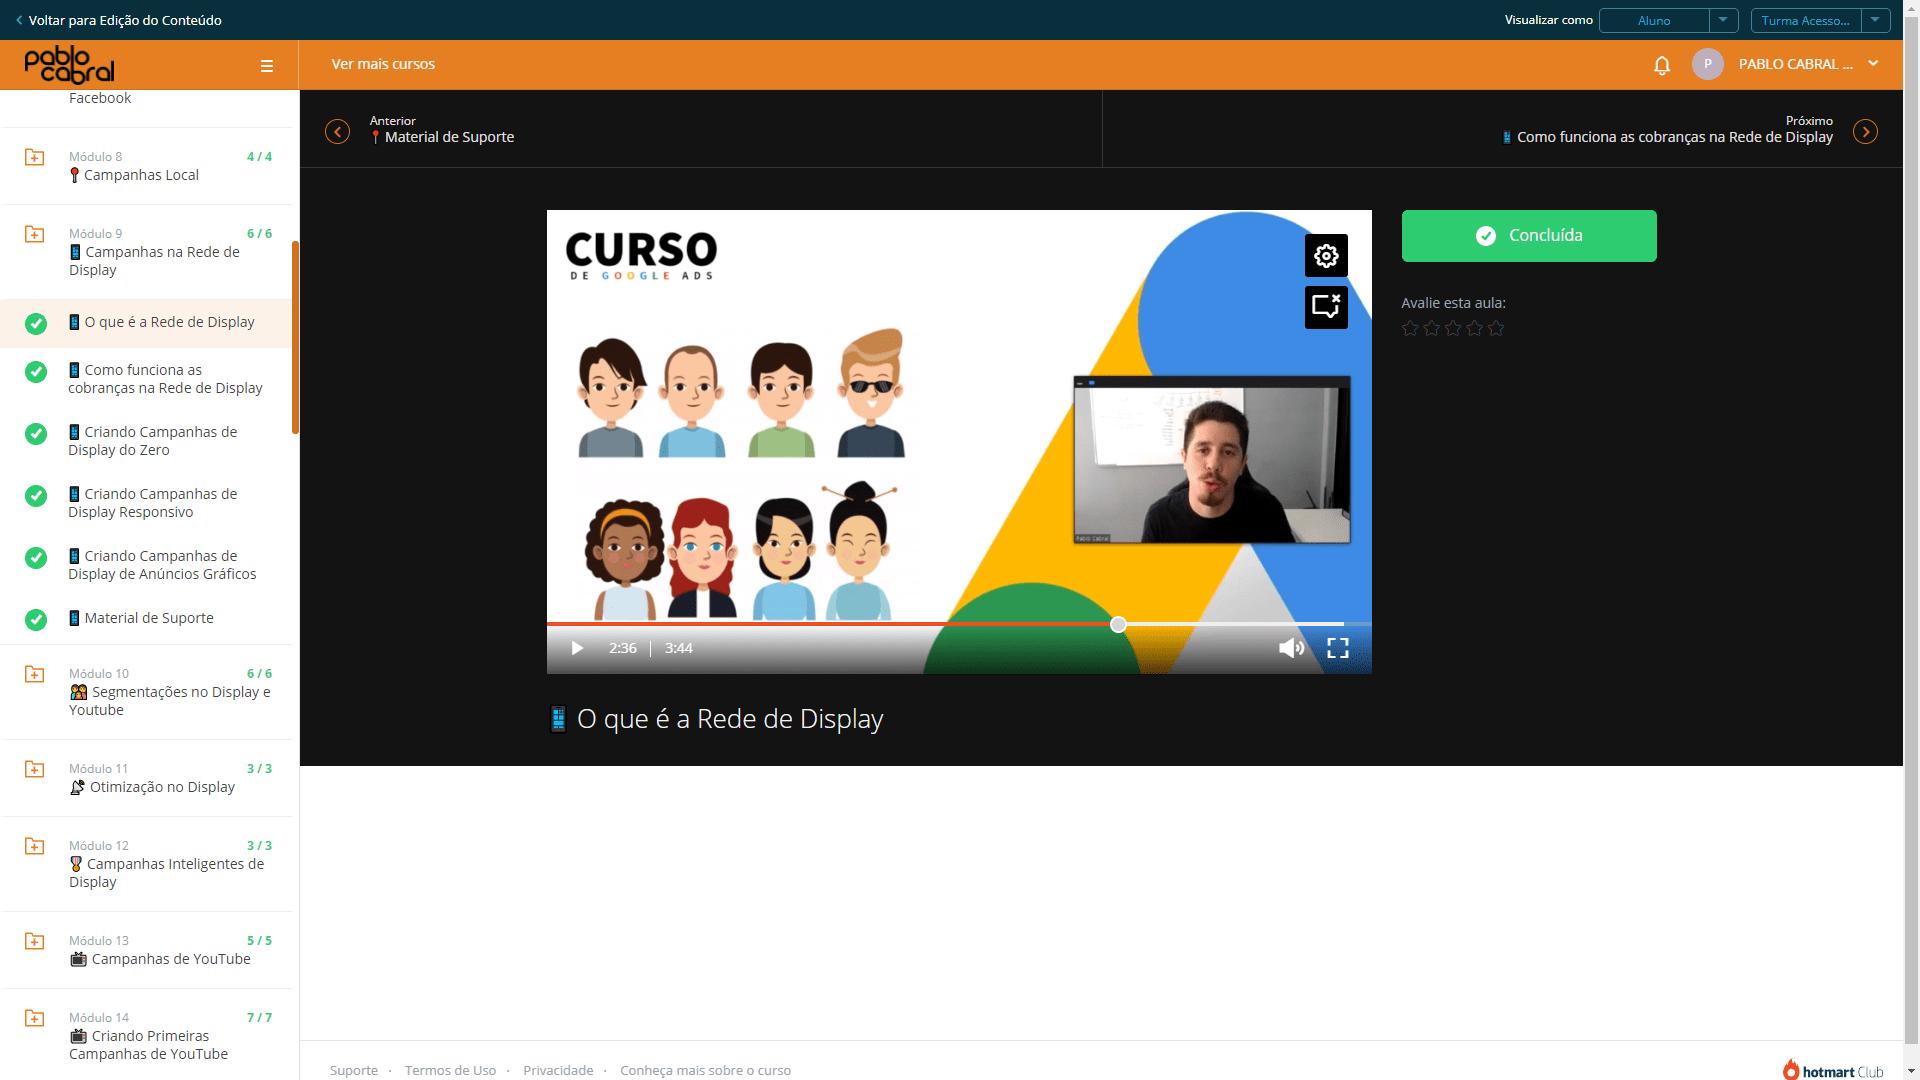 campanhas-de-display-min